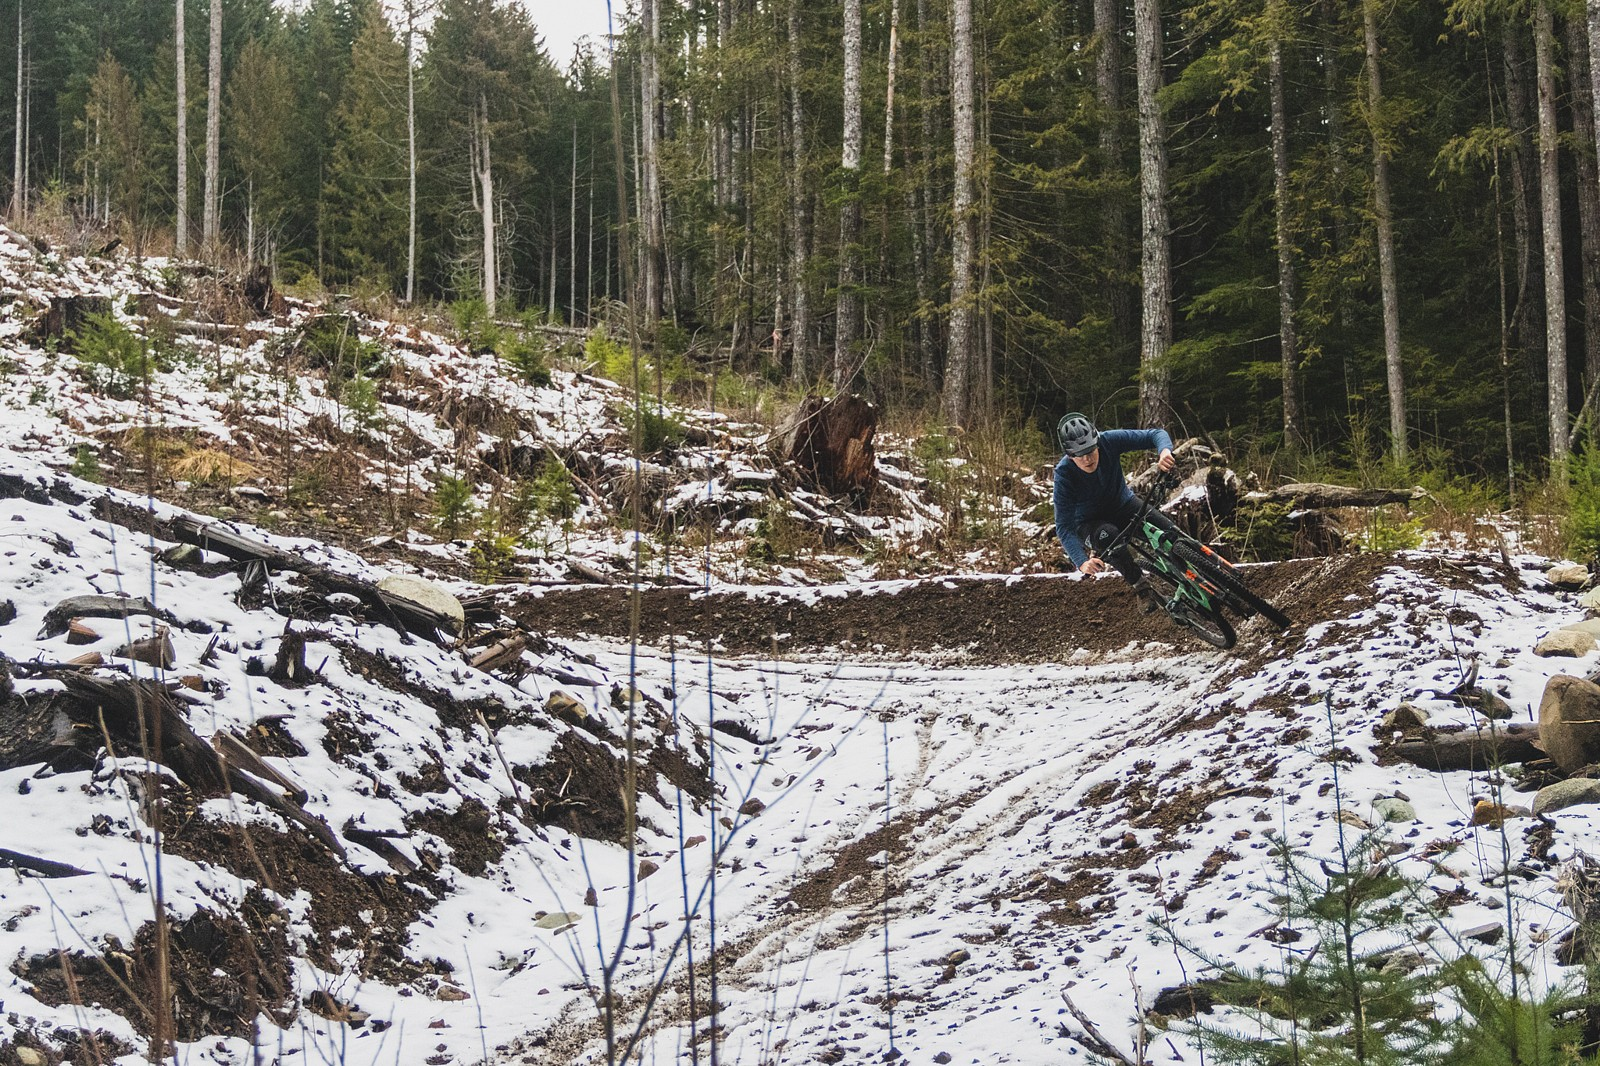 IMG 0081 - 7willmorris - Mountain Biking Pictures - Vital MTB